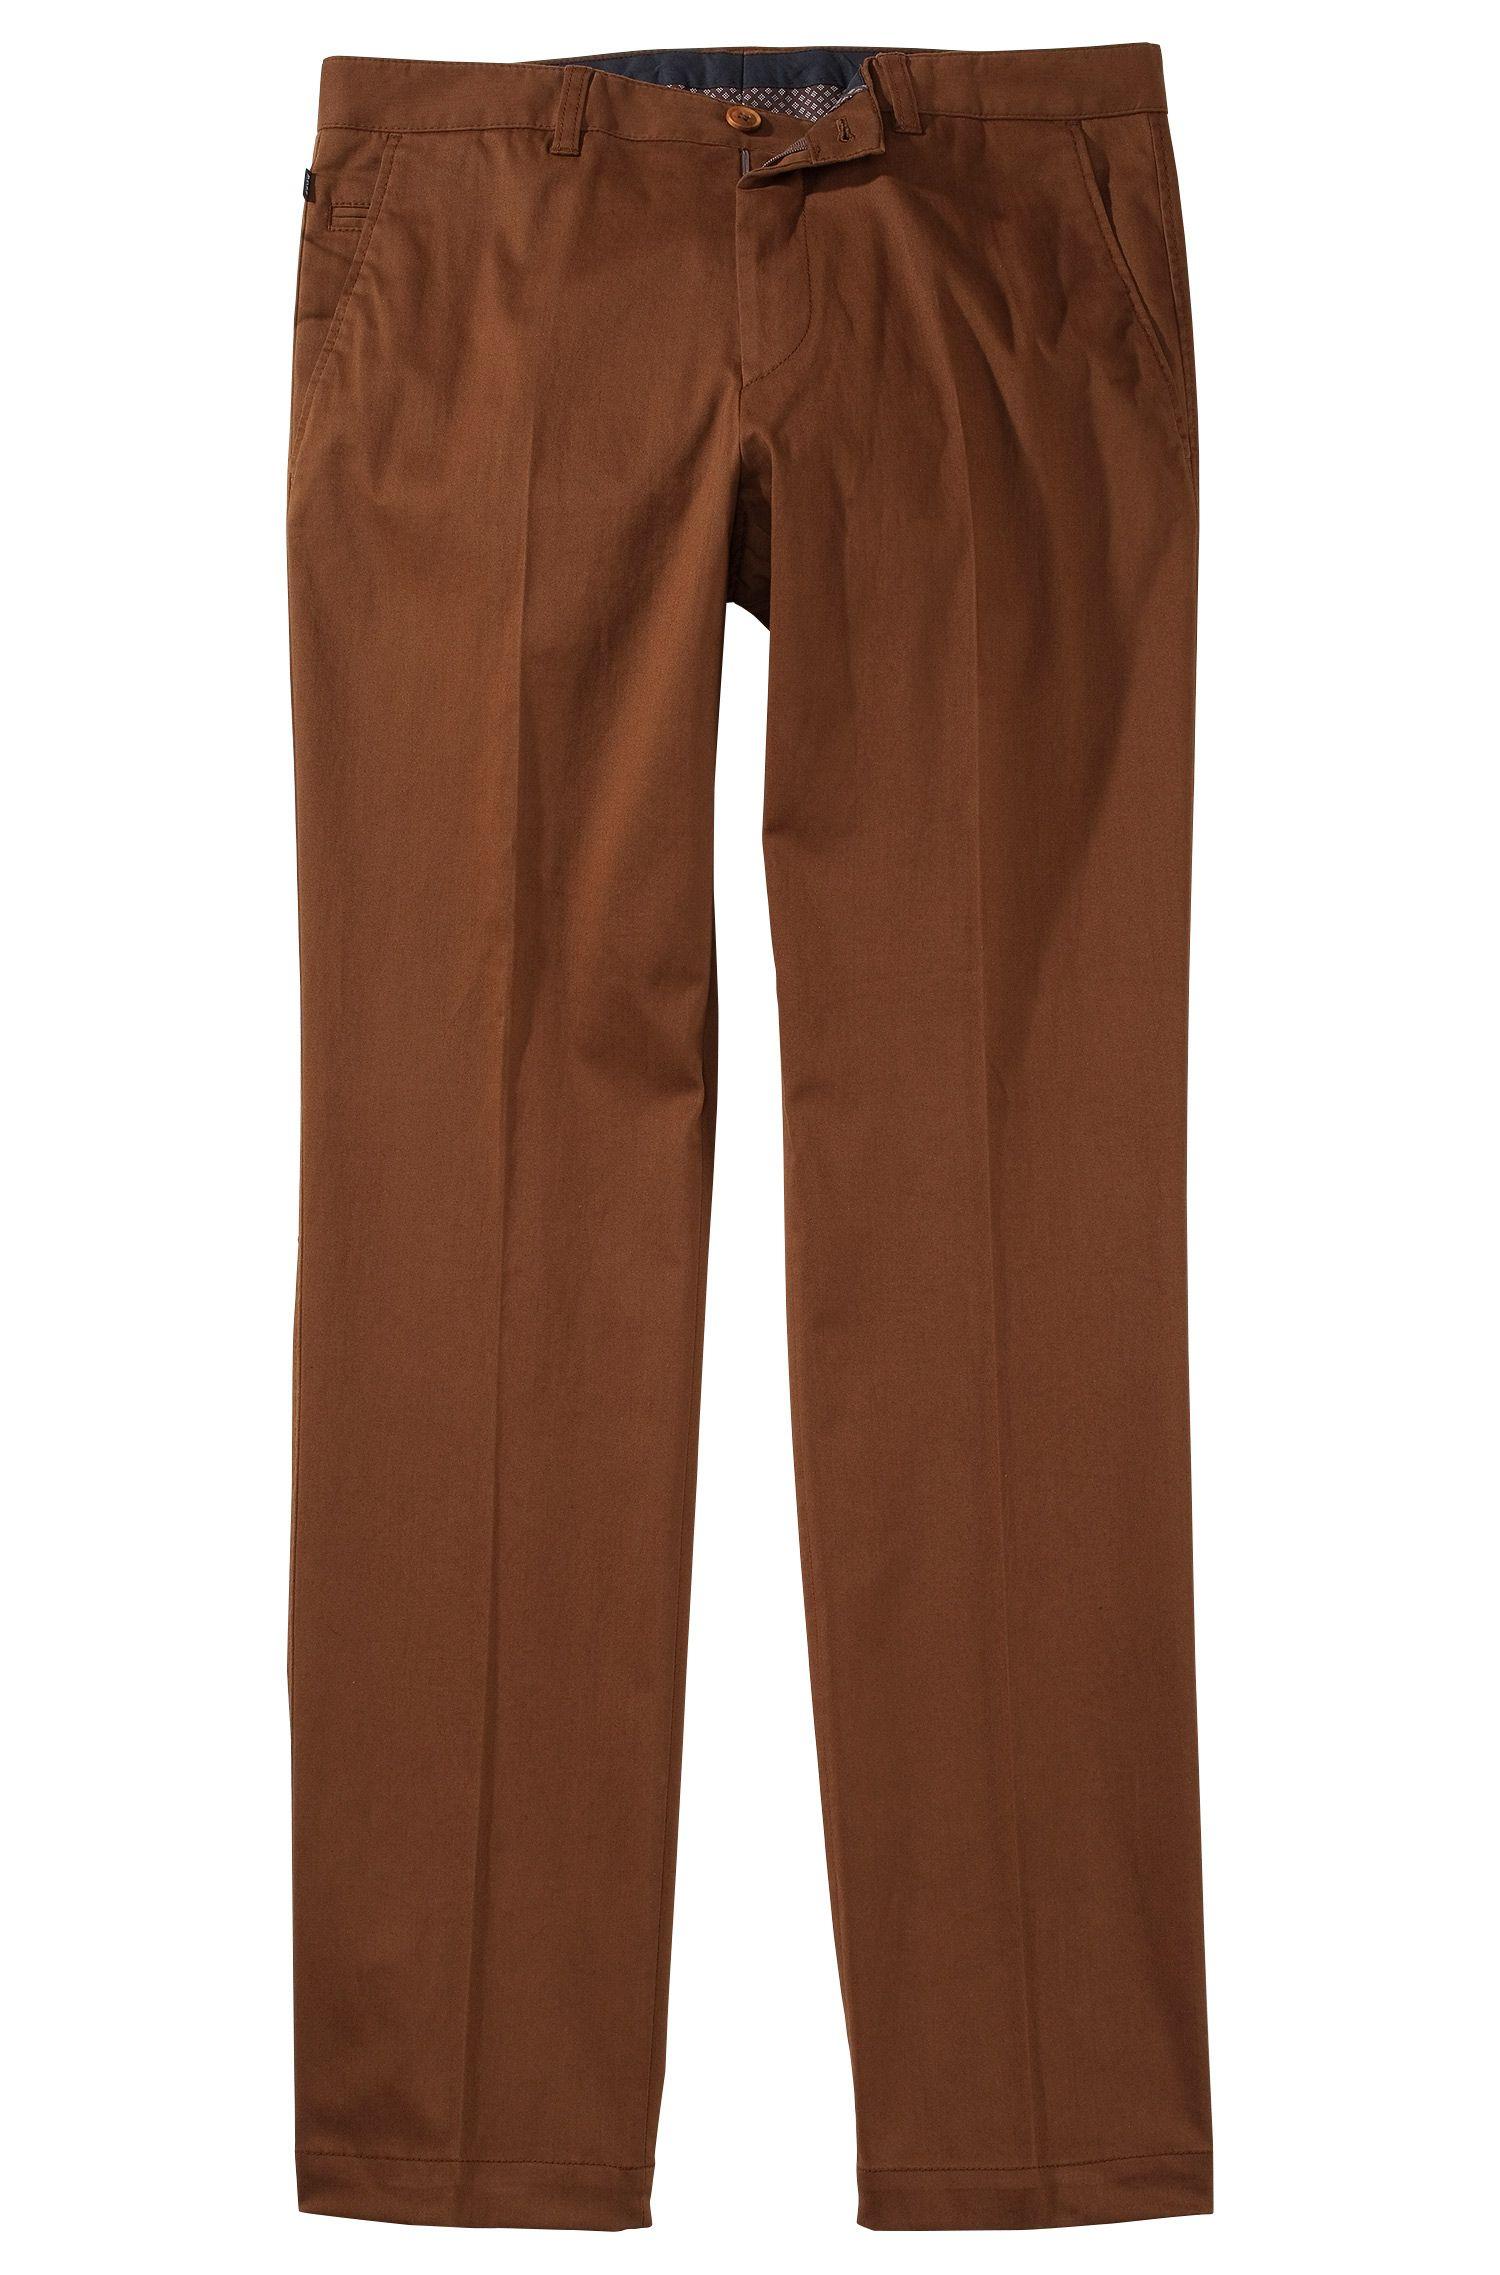 Pantalon de costume coton stretch, Shadow6-W